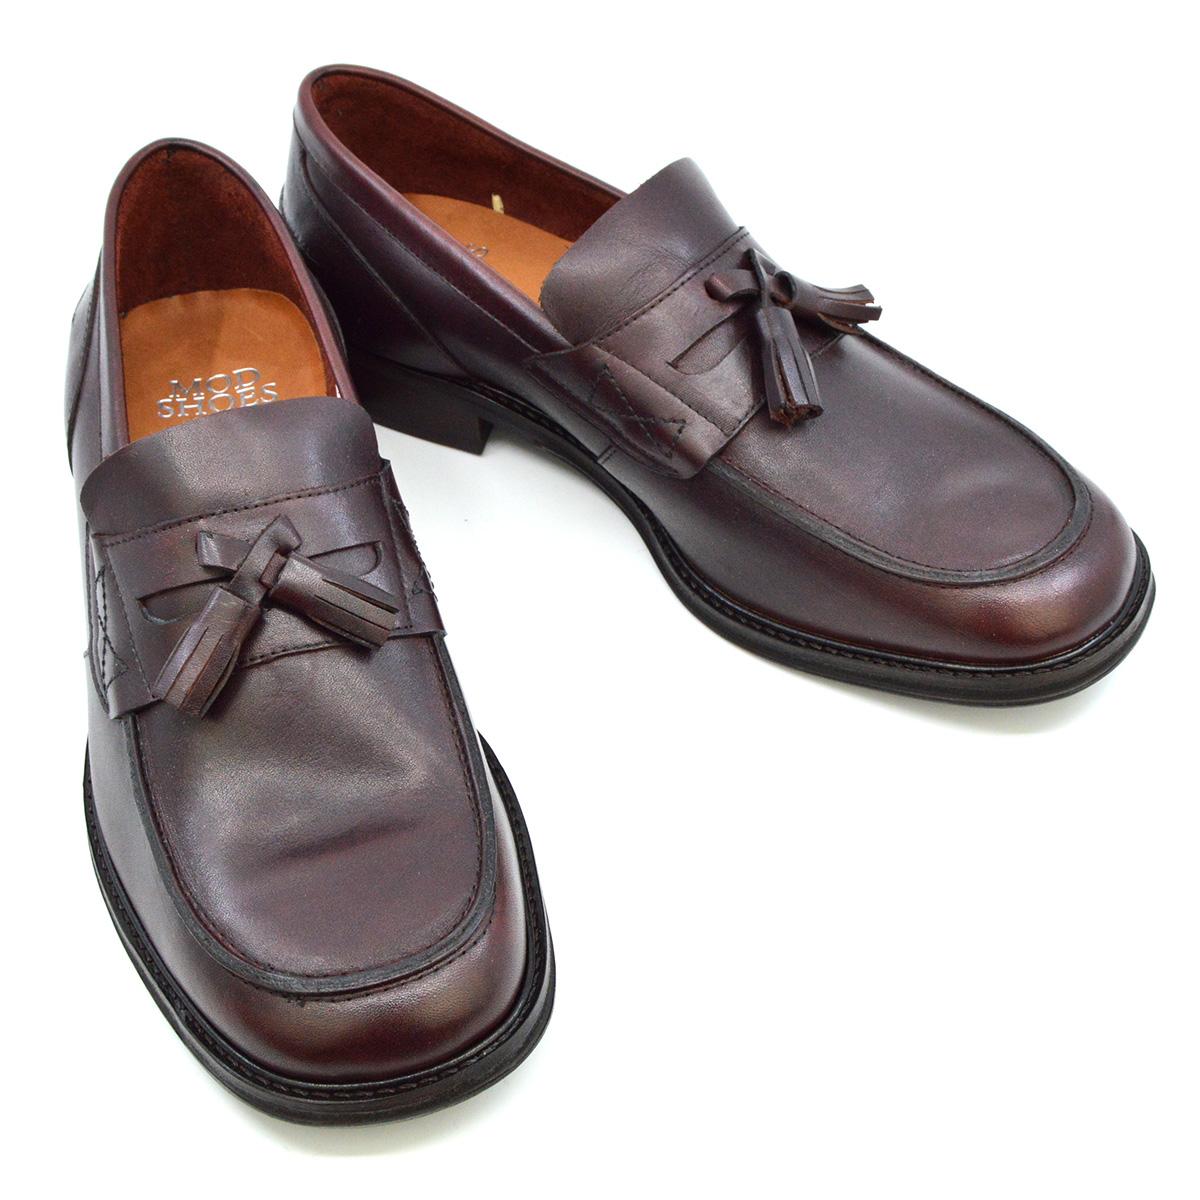 d5a66330a51 Scorchers – Oxblood Tassel Loafers – Ska Skinhead Suedehead 60s-70s ...